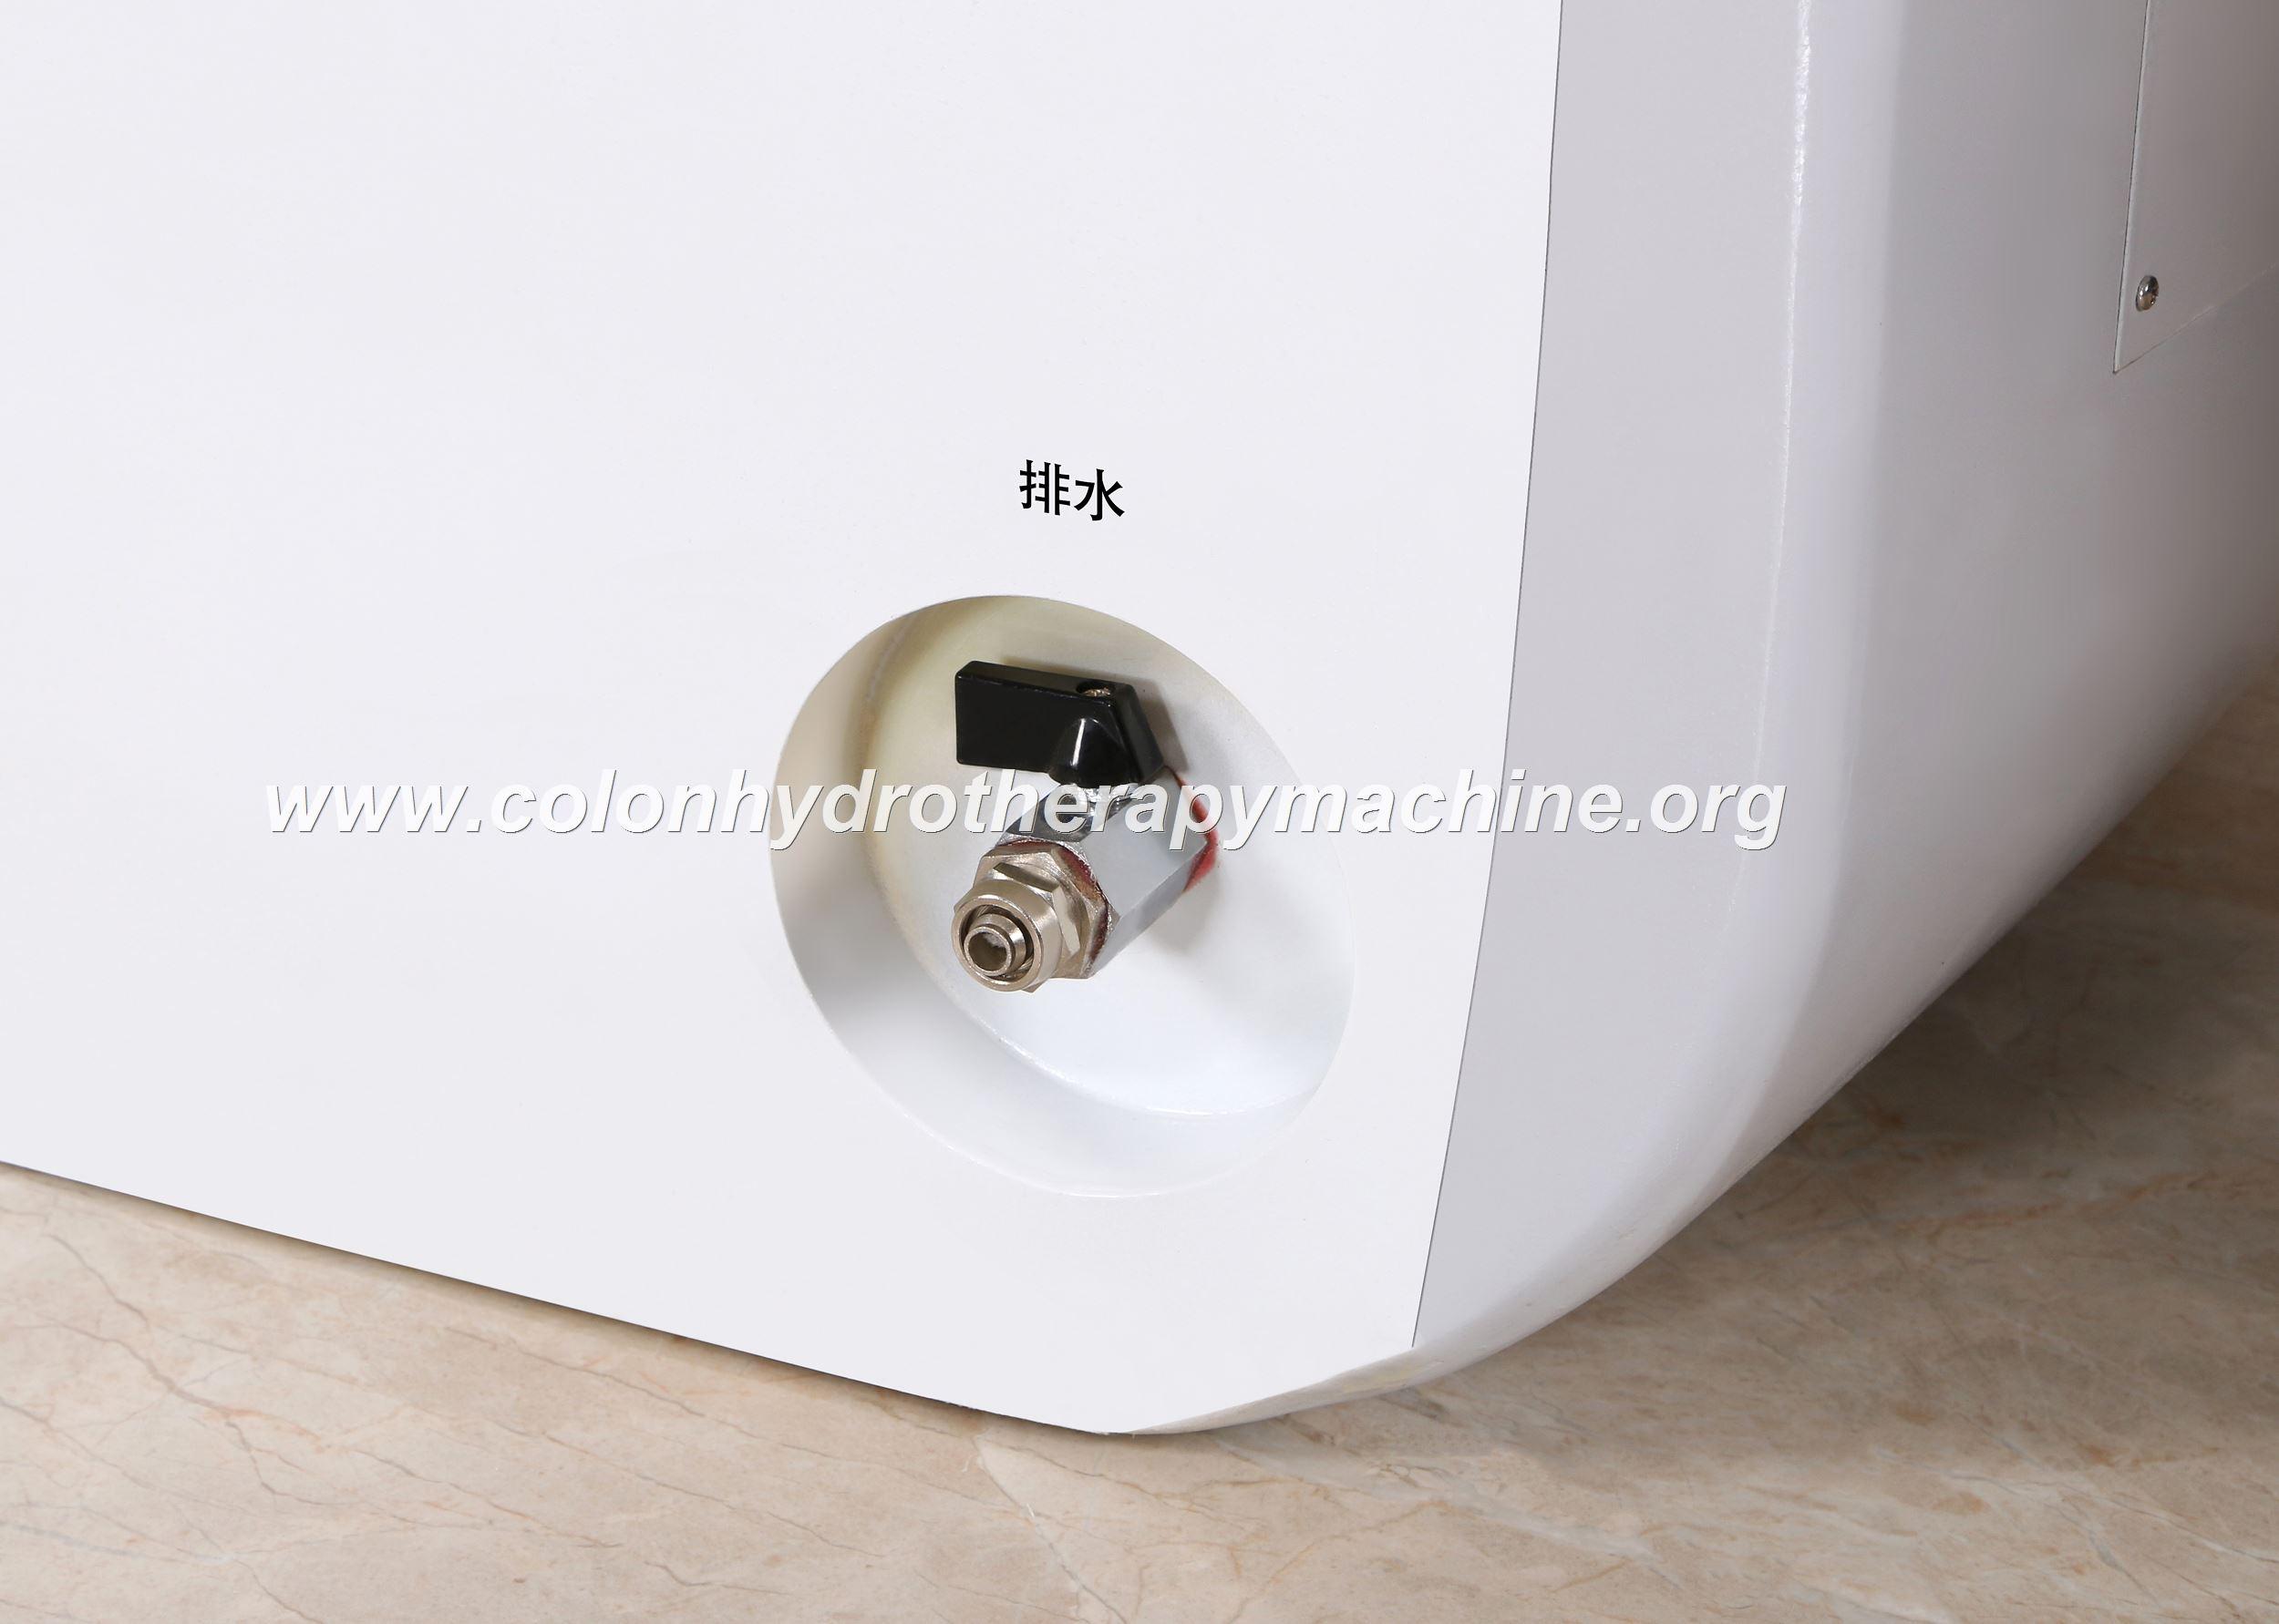 libbe colon hydrotherapy device